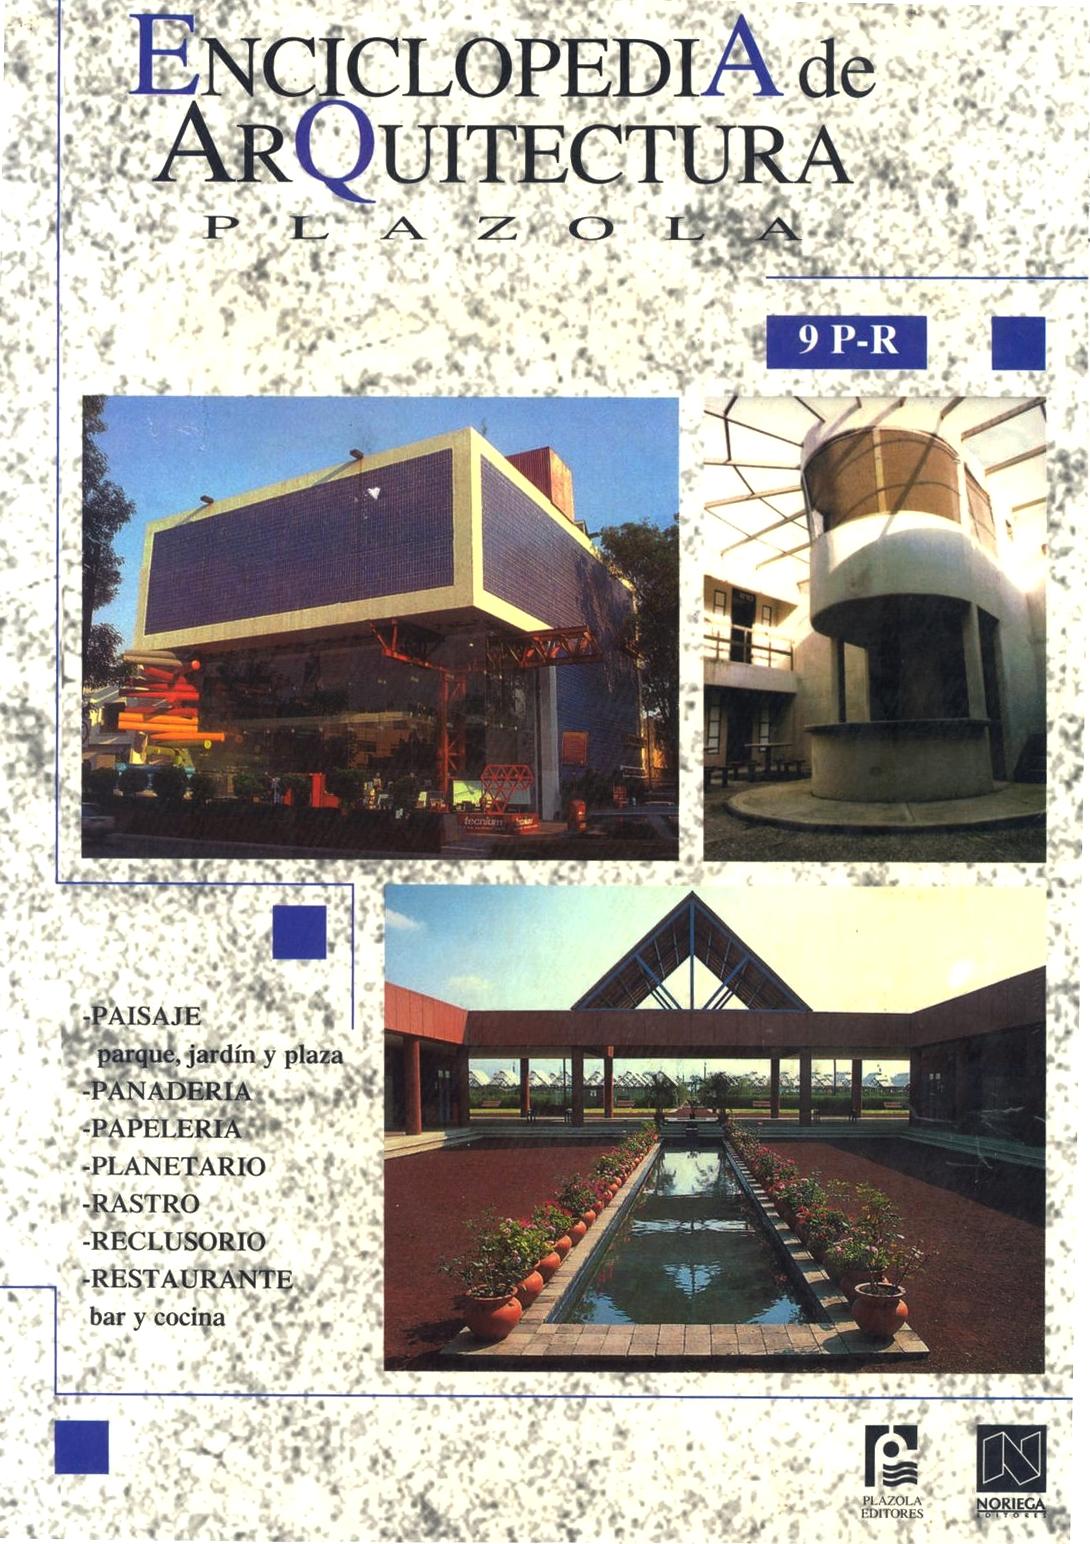 Novedades Sti Enciclopedia De Arquitectura Plazola